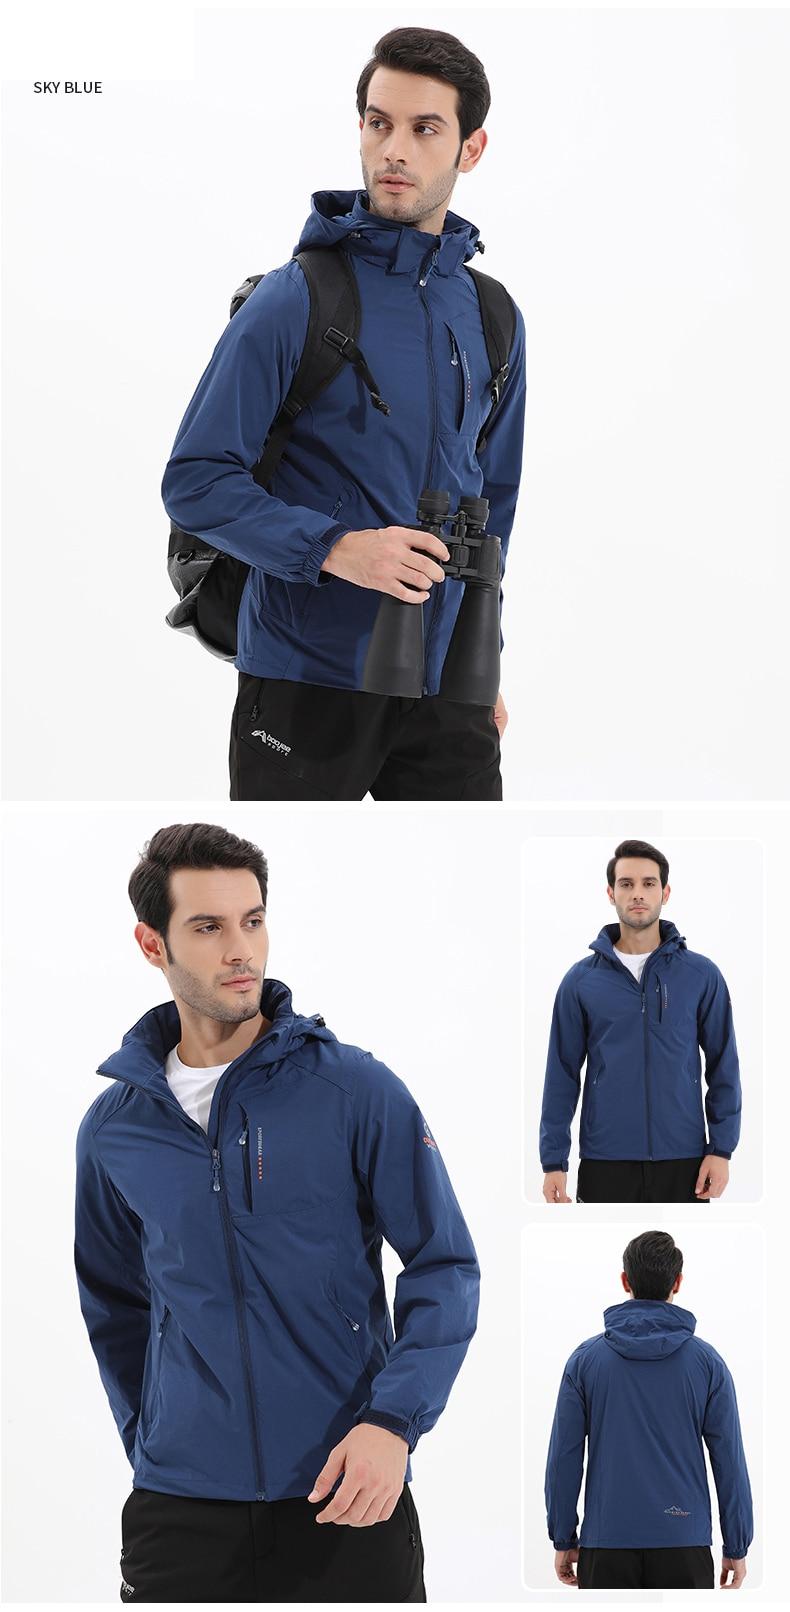 Mens-Softshell-Hiking-Jackets-(14)